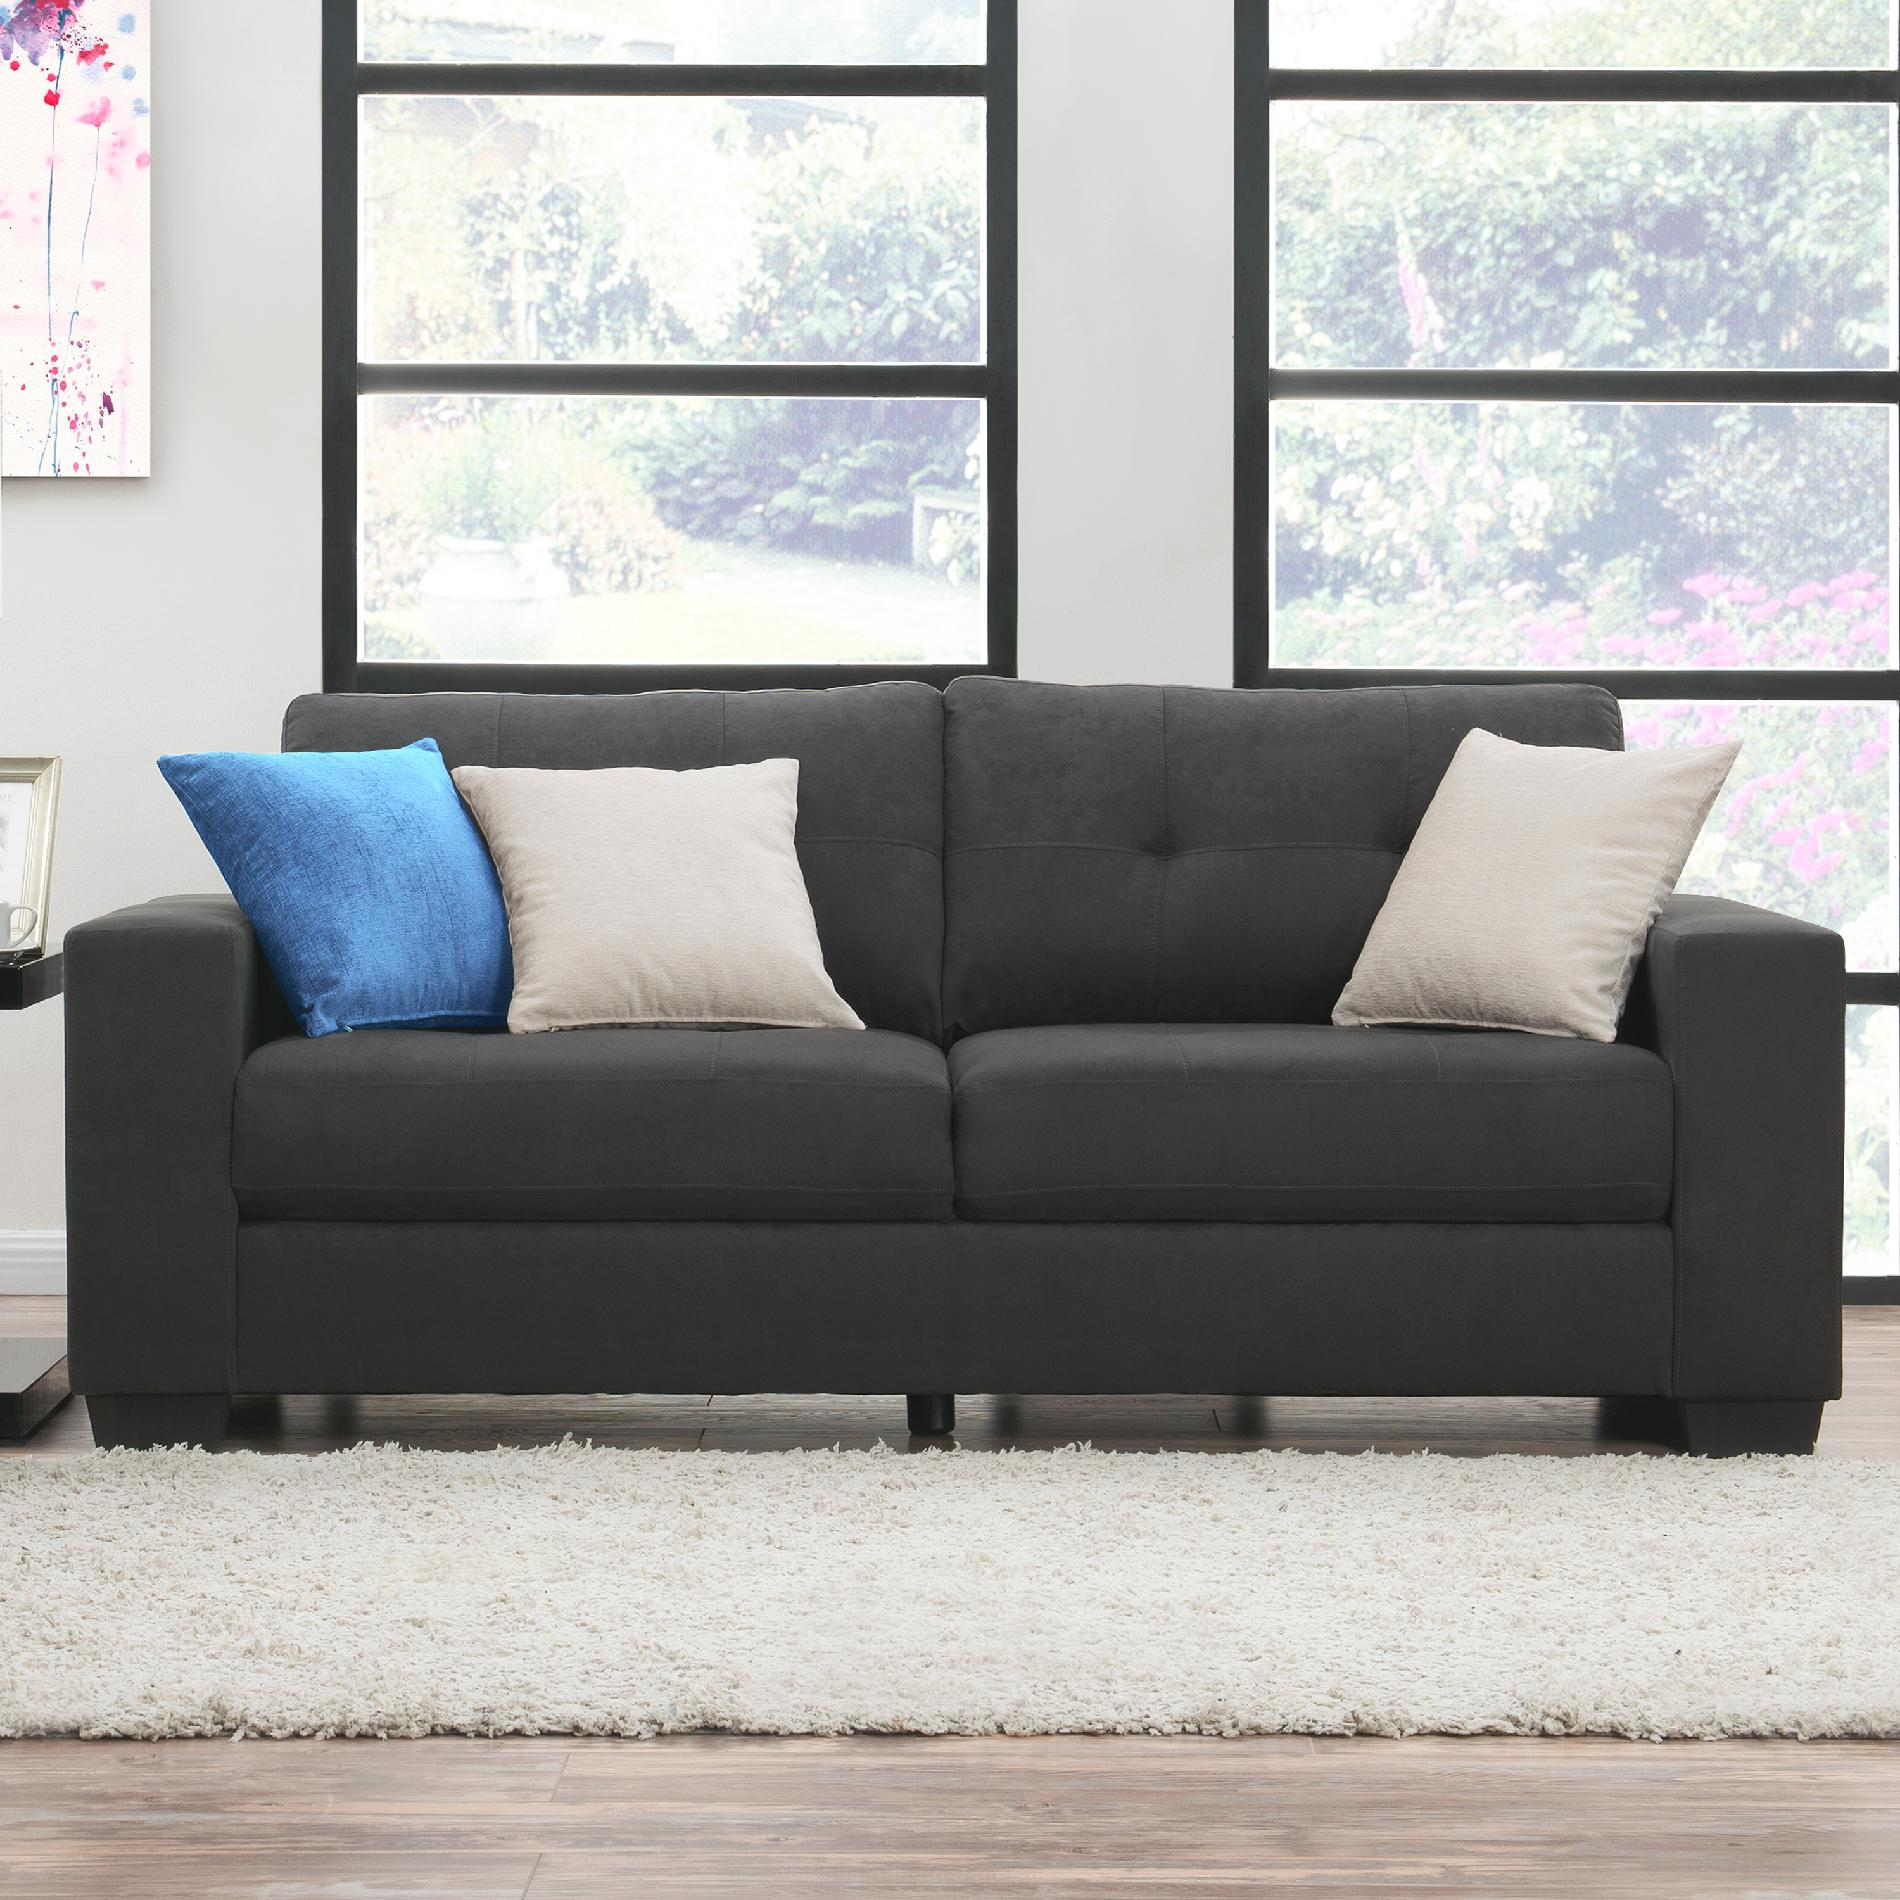 gray microfiber sectional sofas repair sofa cushion puchong dorel home furnishings asher sears